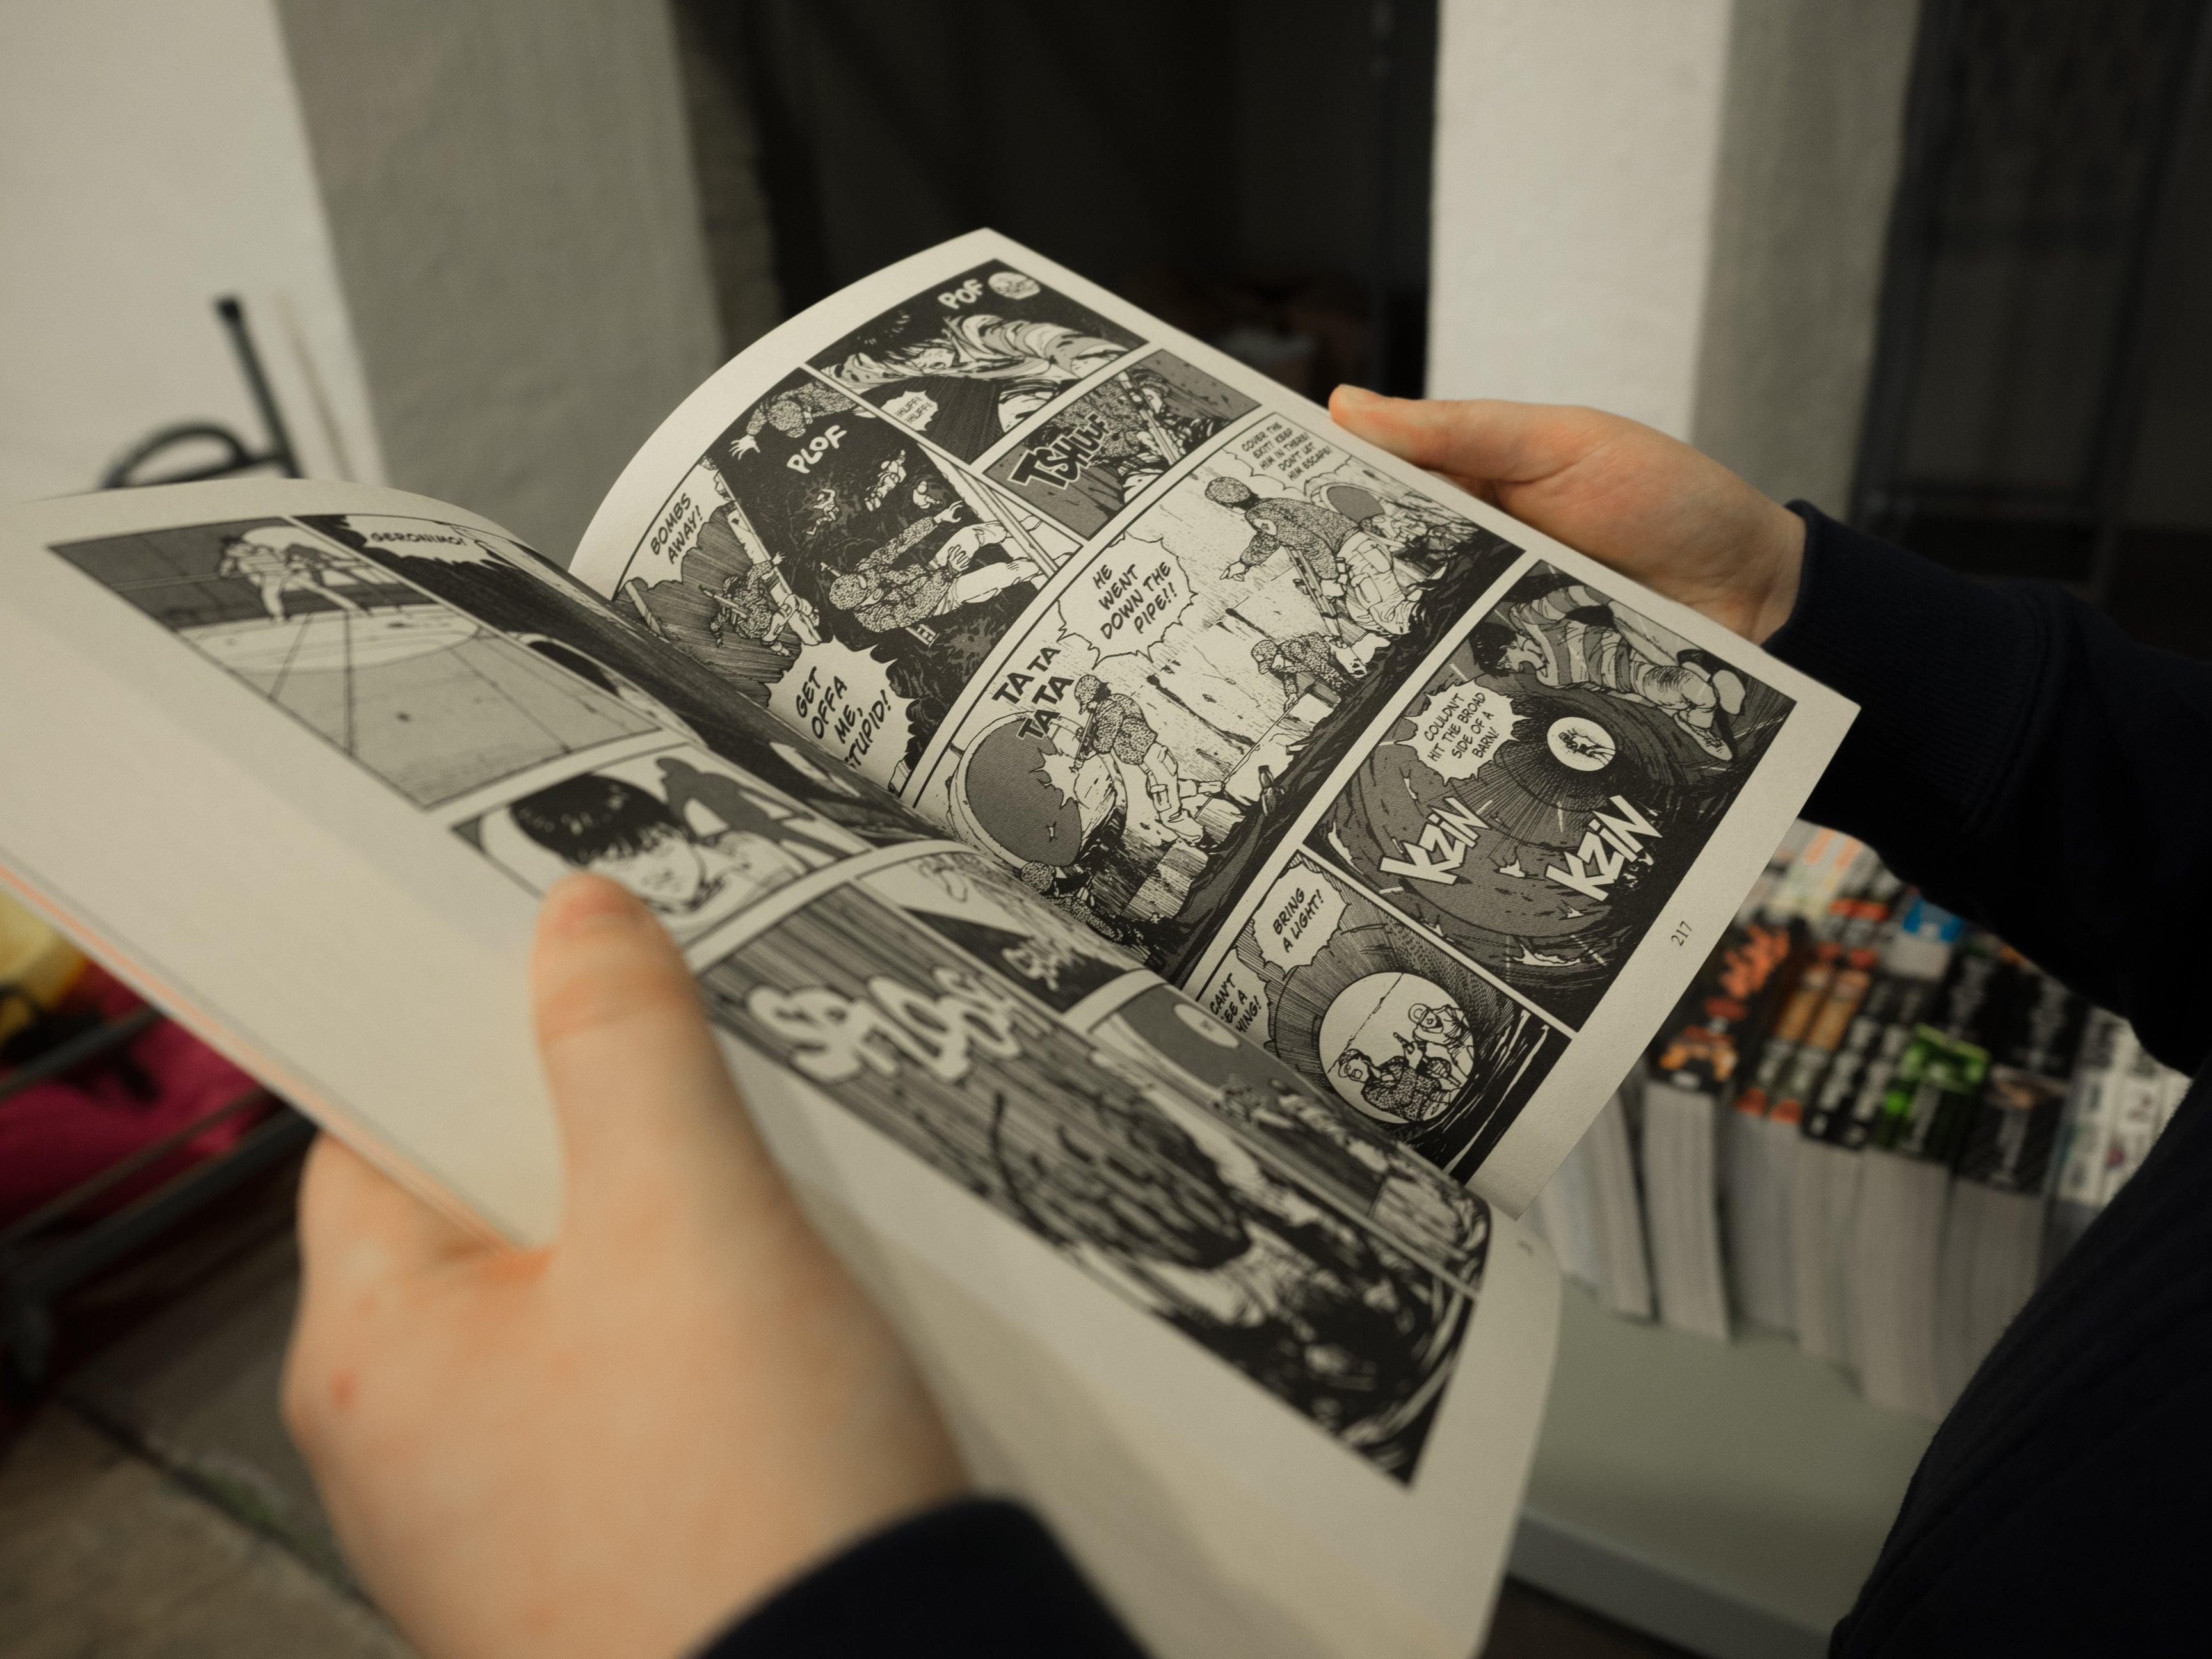 persona leyendo manga